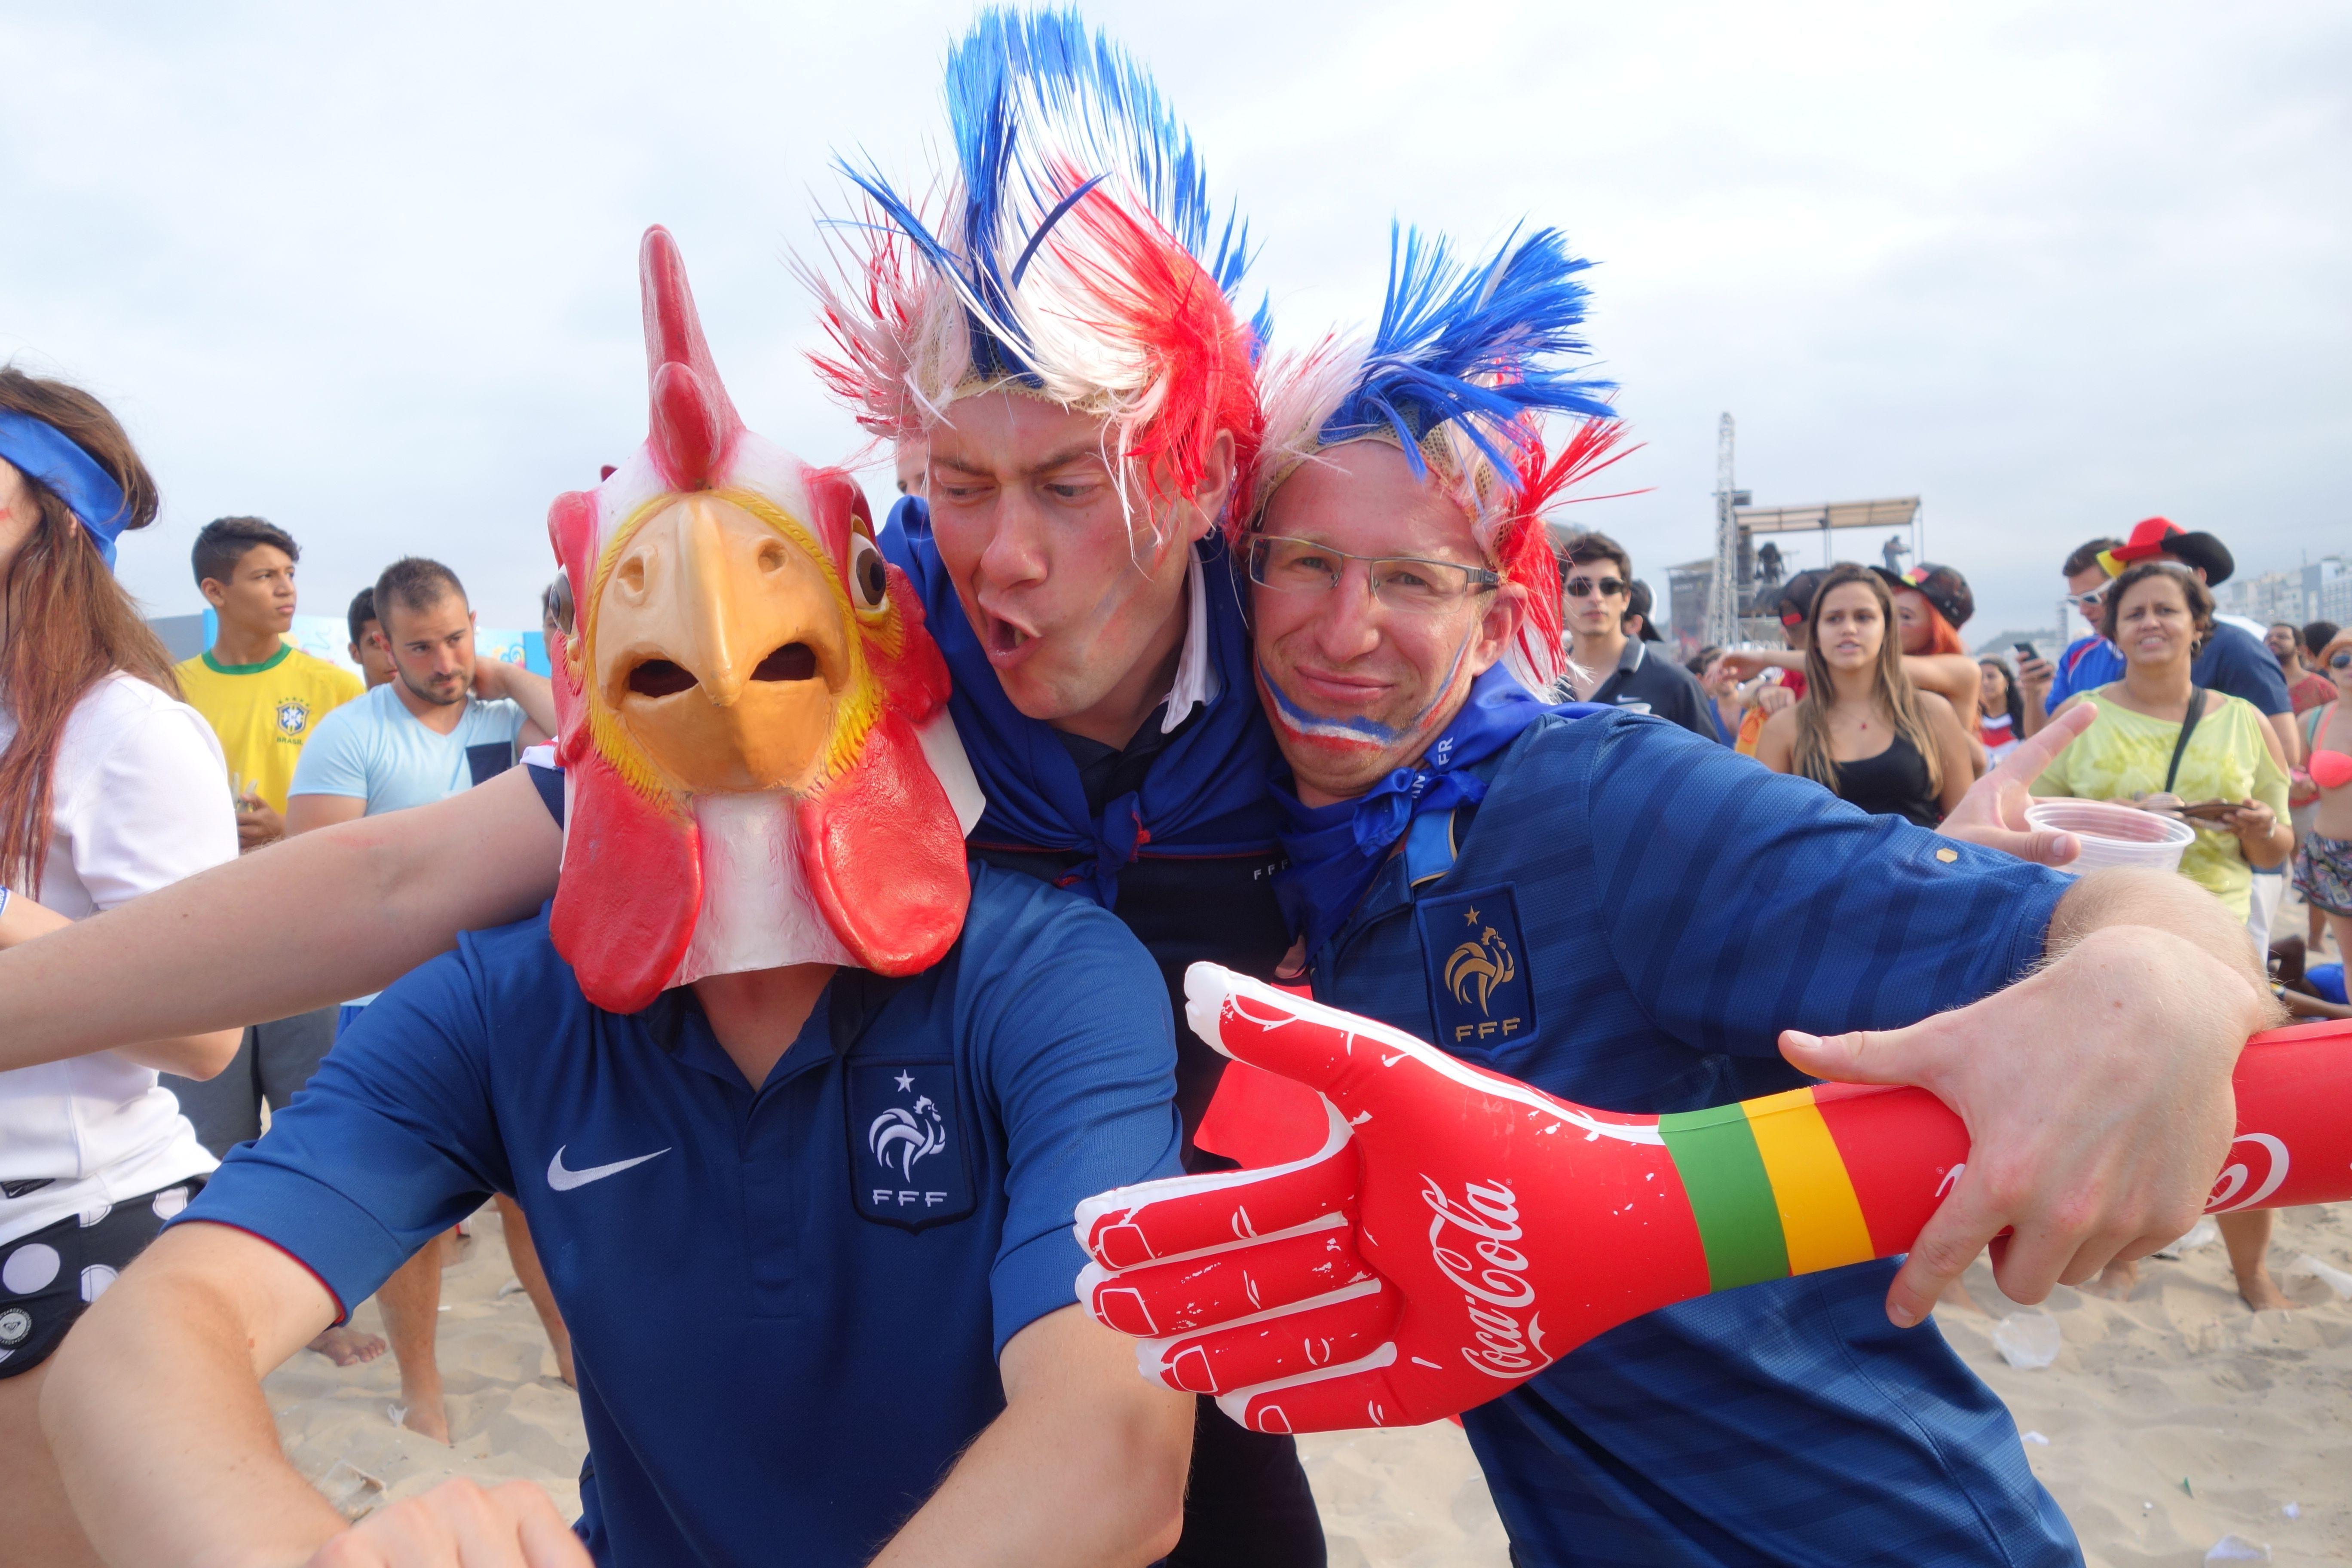 Coupe du Monde de Football: France-Nigeria au Fifa Fan Fest de Copacabana.